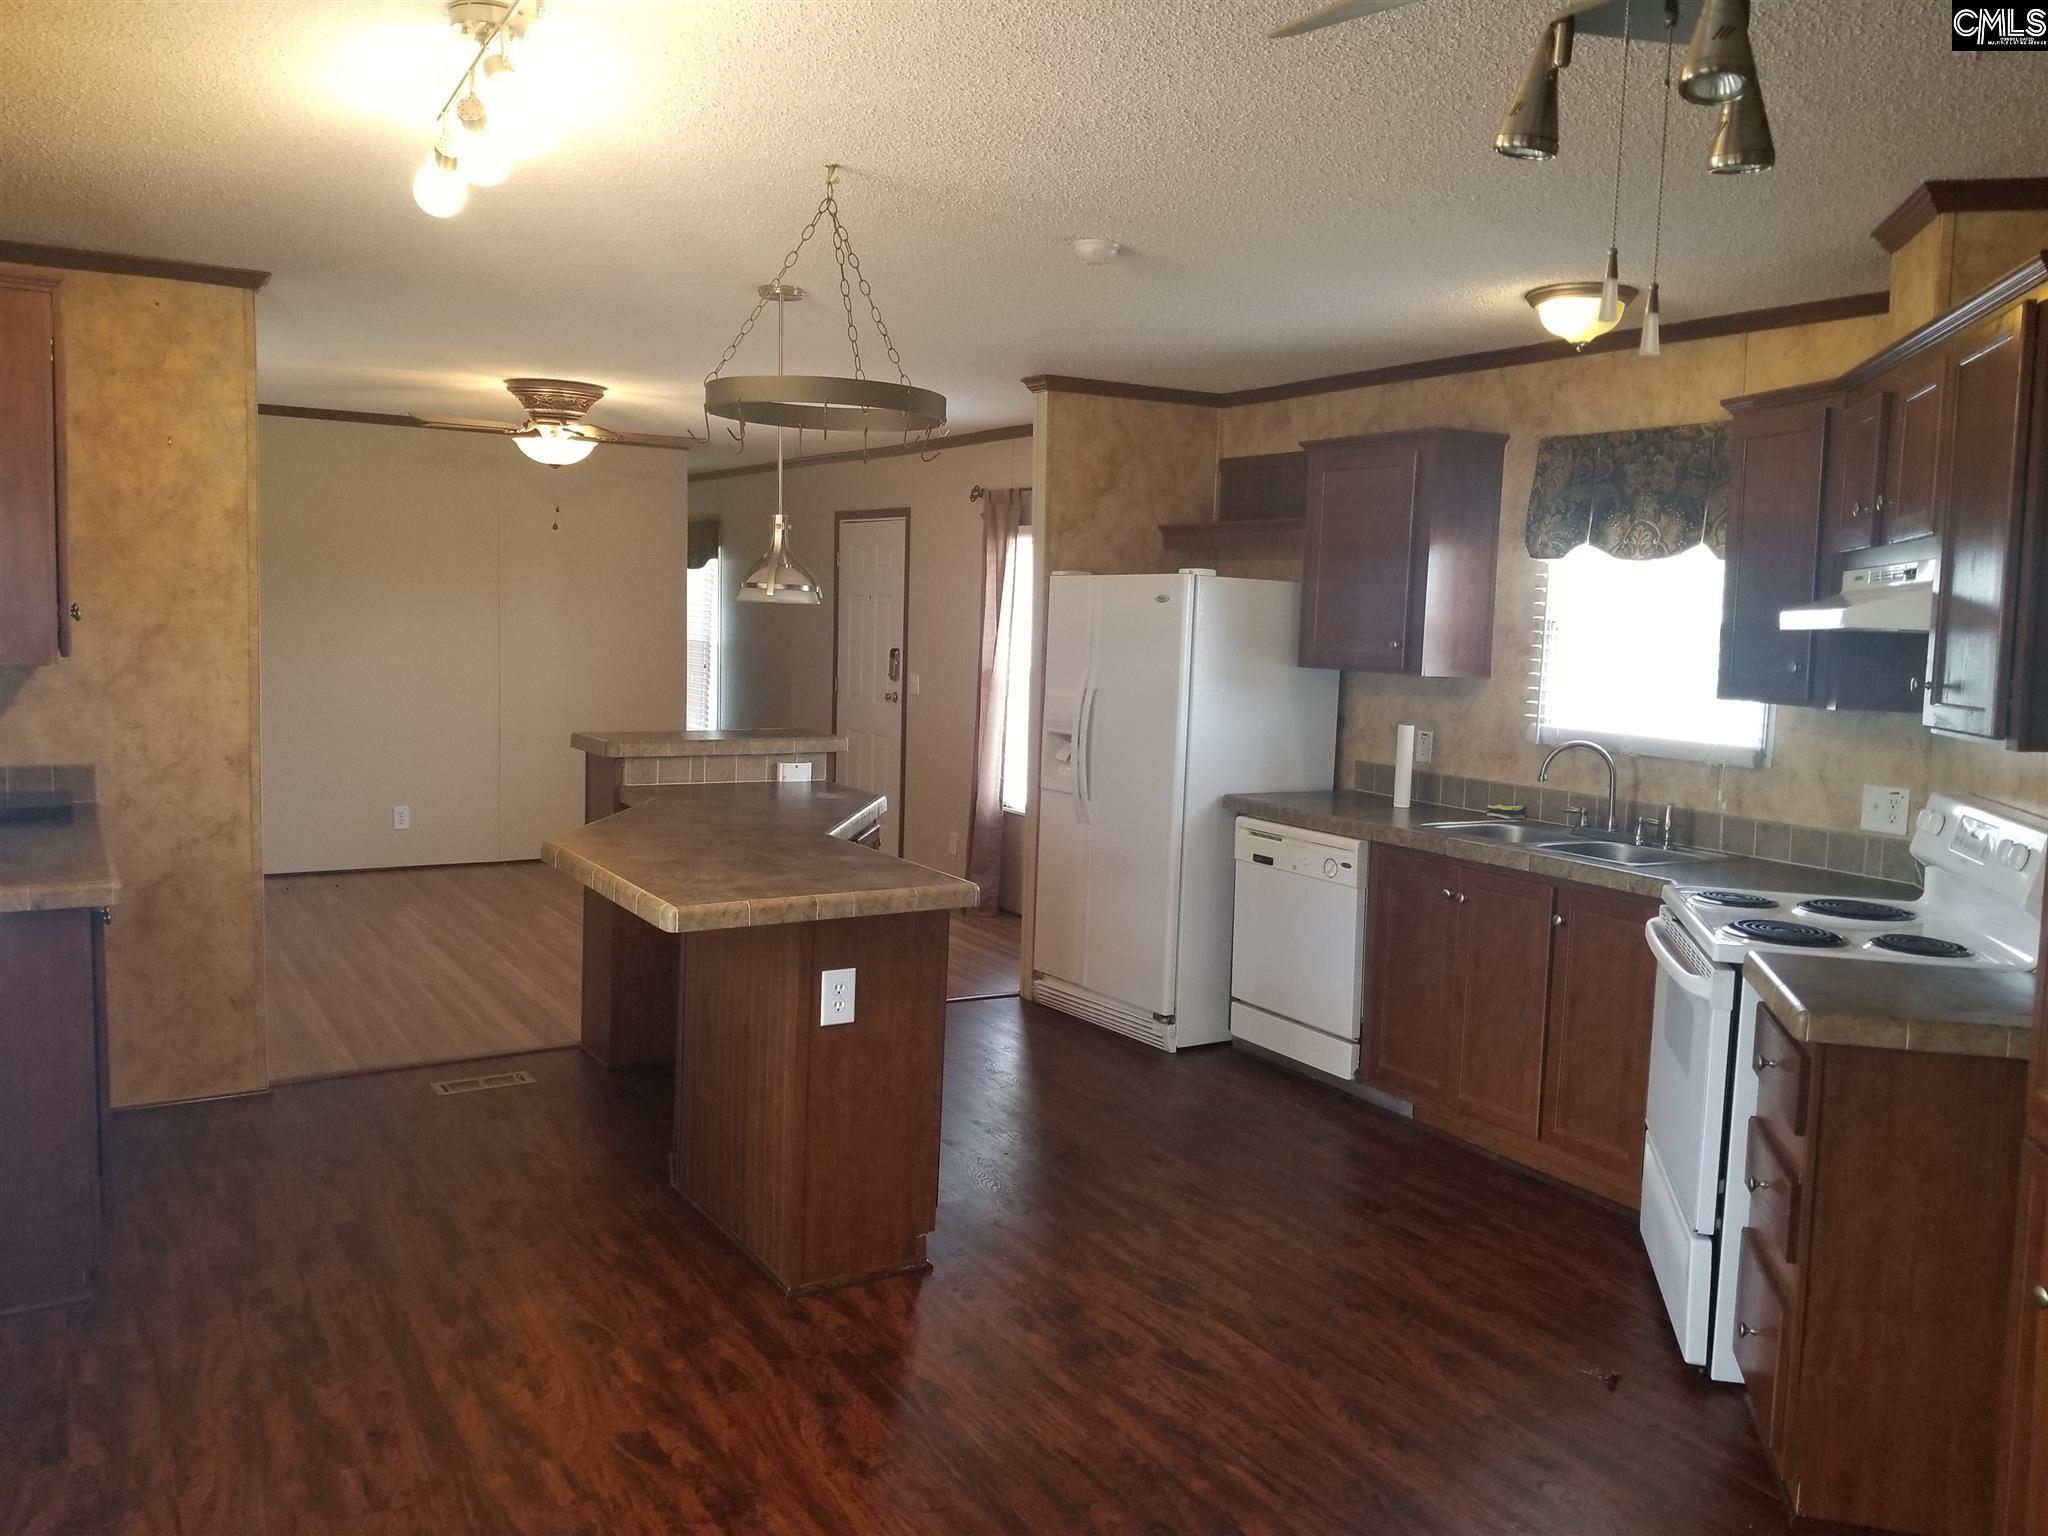 Real Estate in Gaston, SC